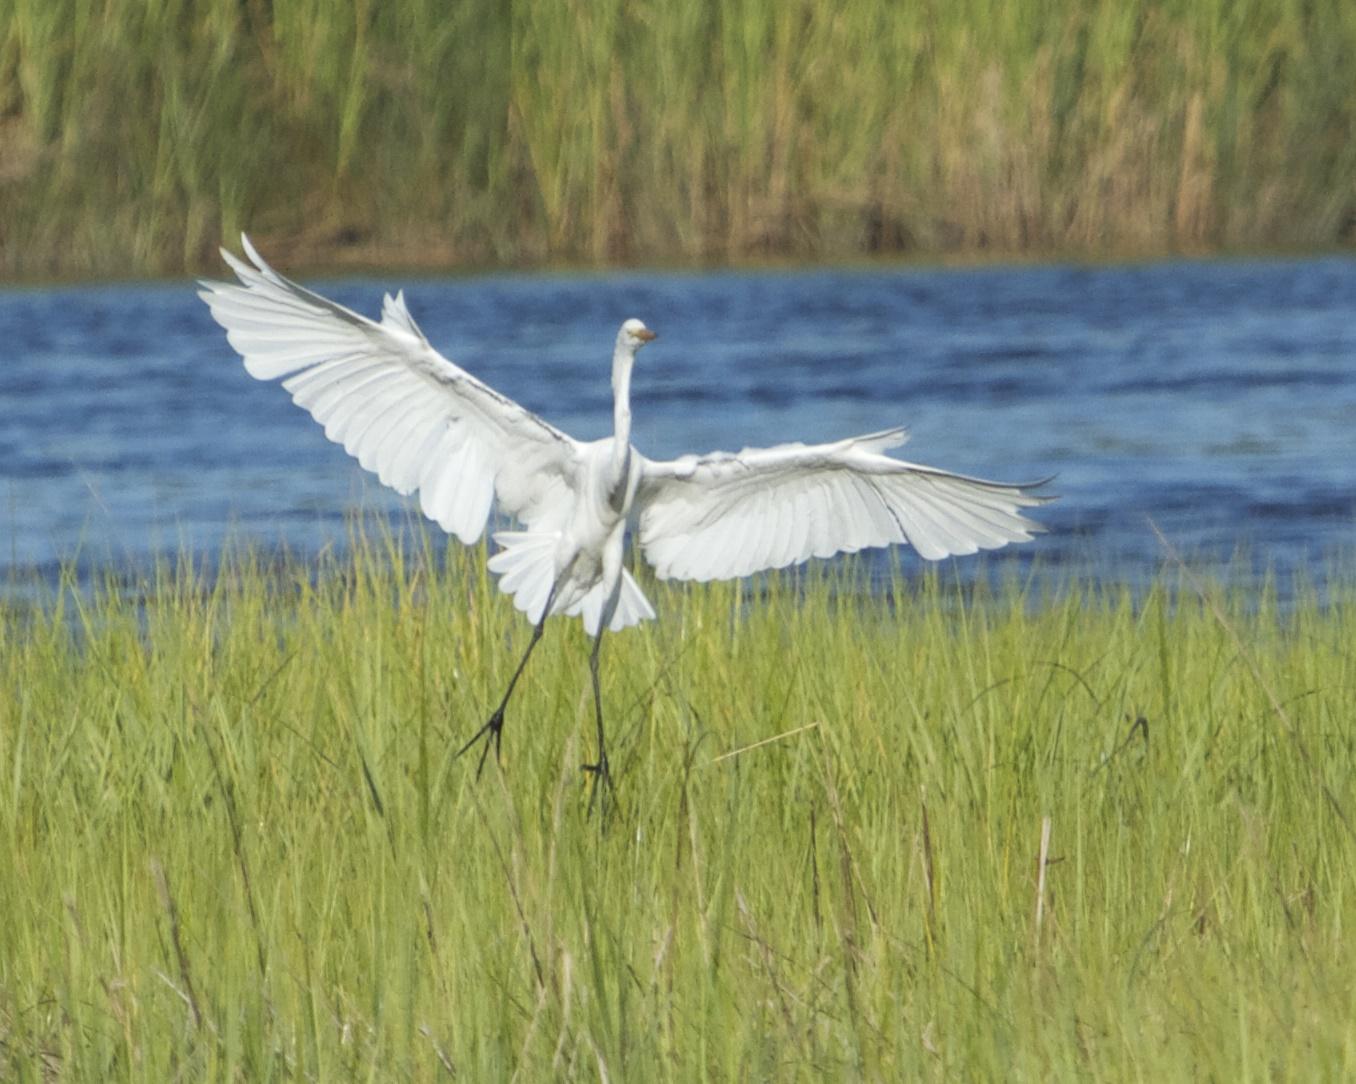 Great Egret makes a more Graceful landing approach!